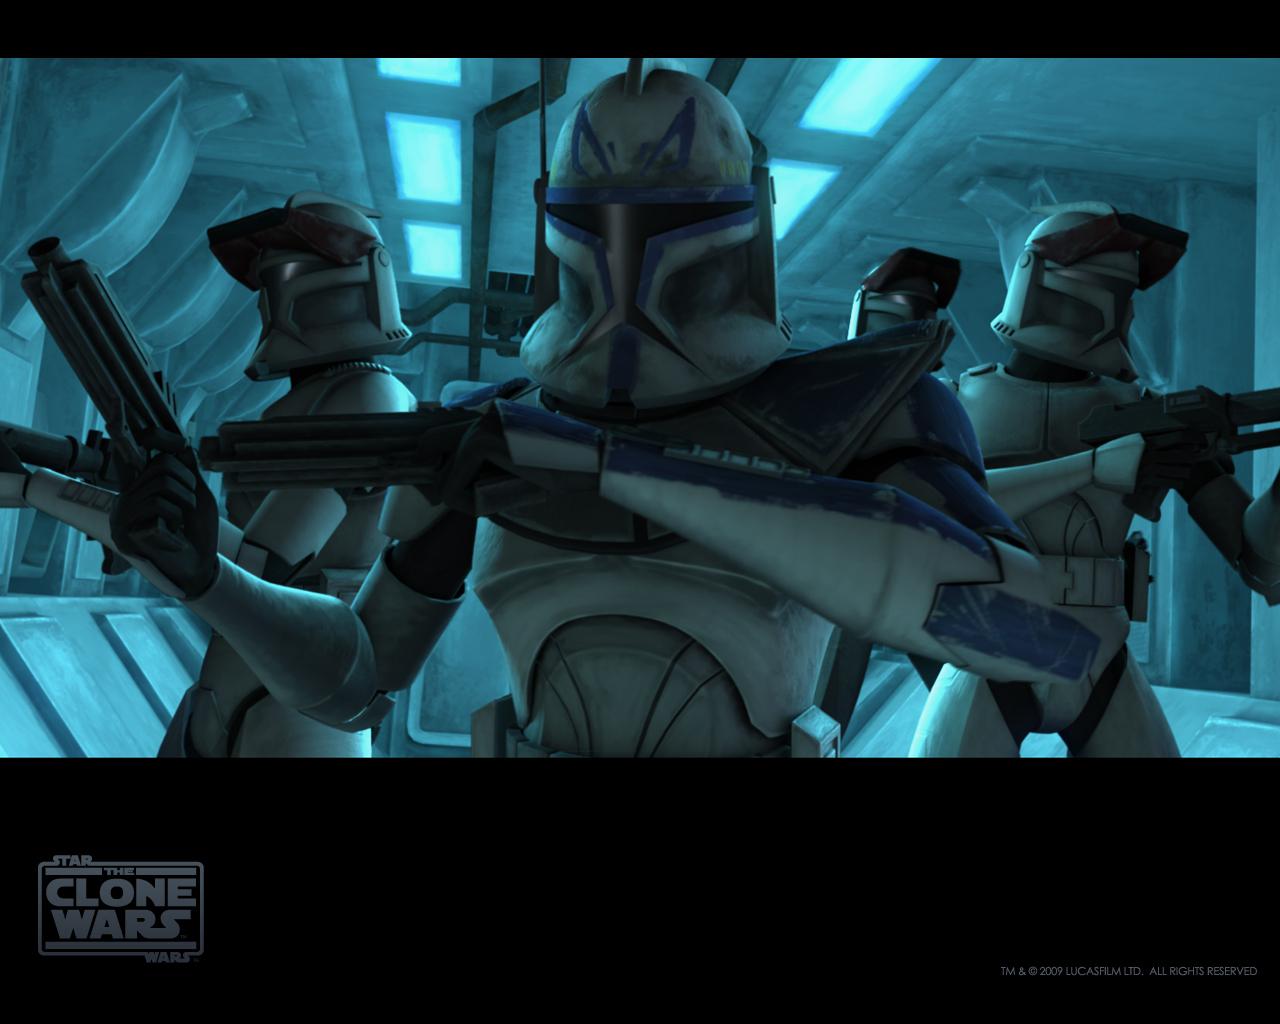 Clone Troopers Bintang Wars Wallpaper 17136648 Fanpop